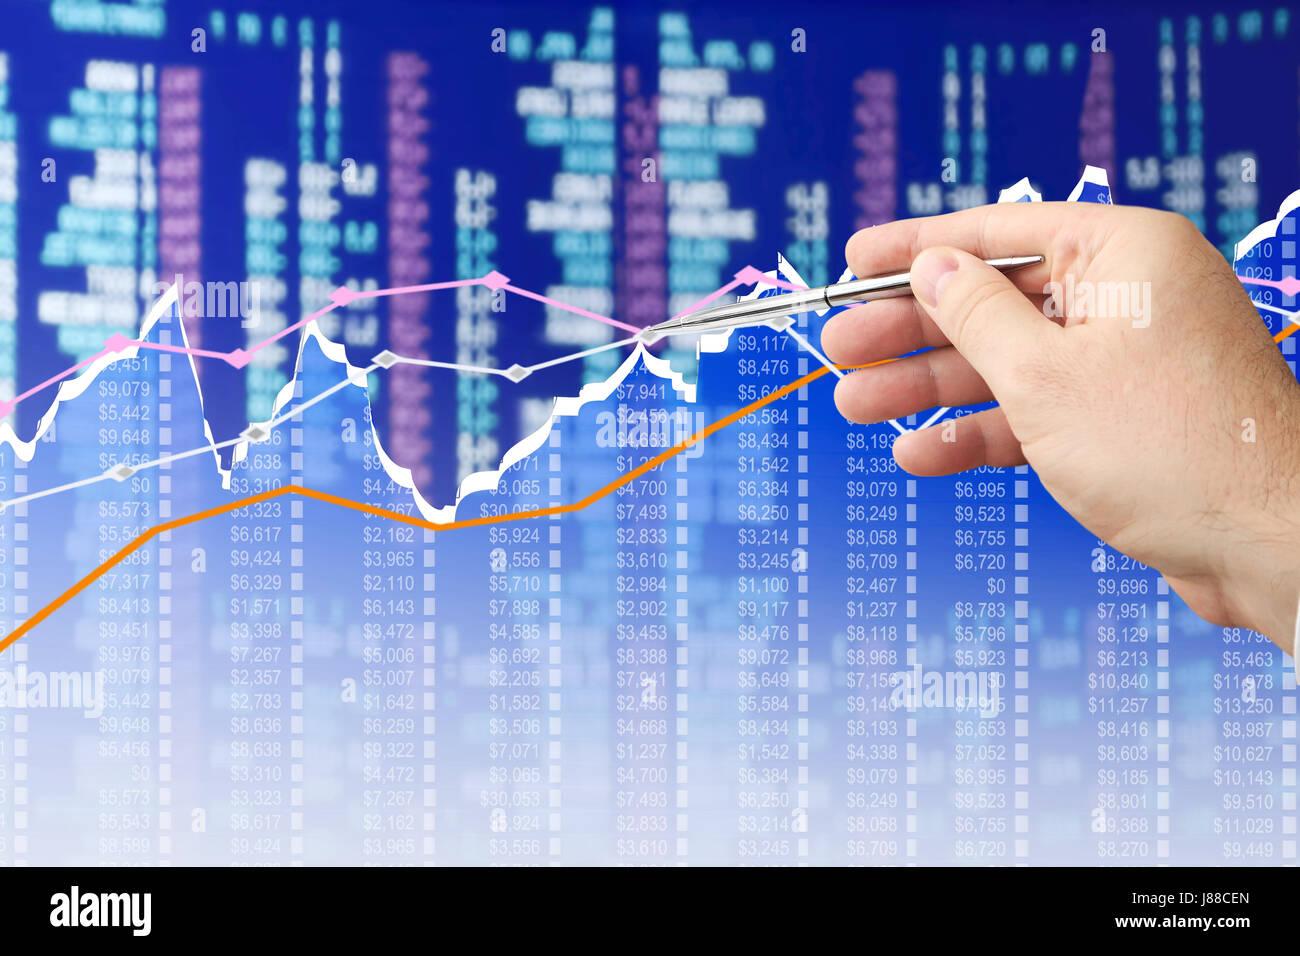 Analyzing Diagram - Stock Image